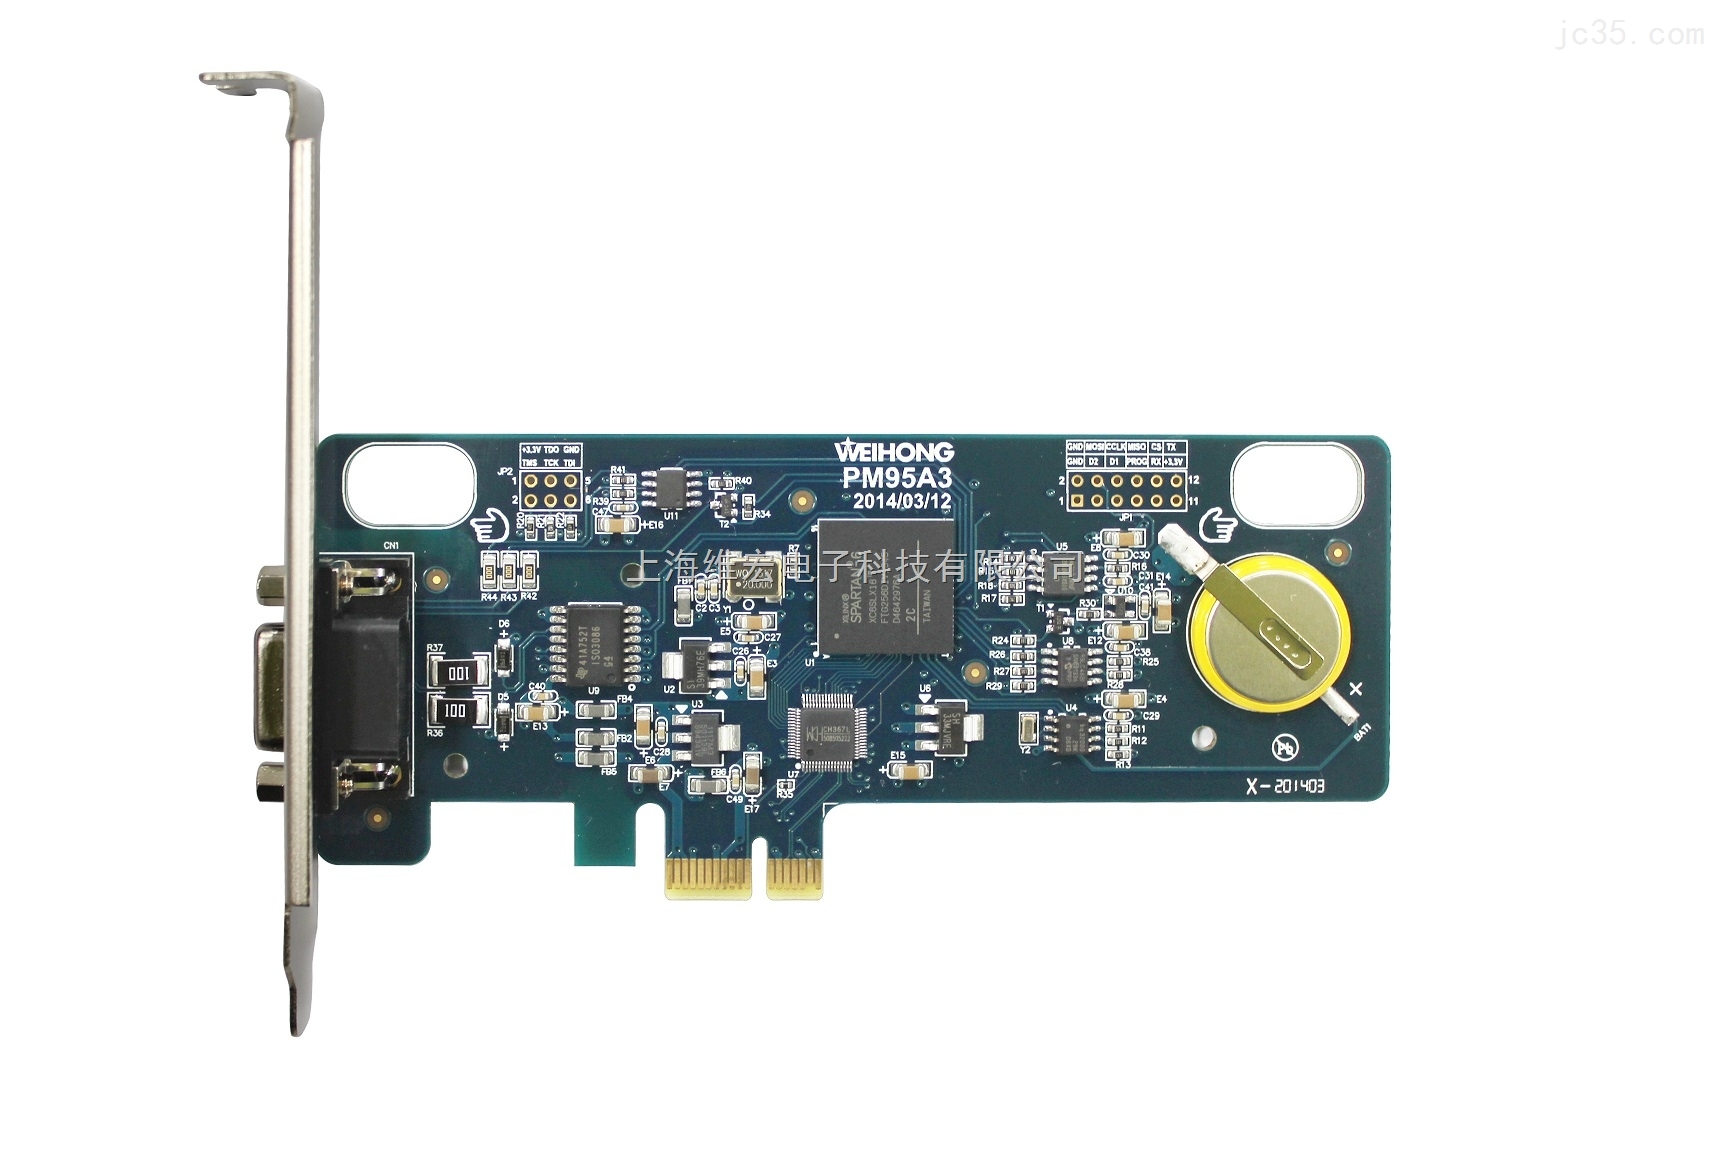 PM53系列简易型运动控制卡全面升级